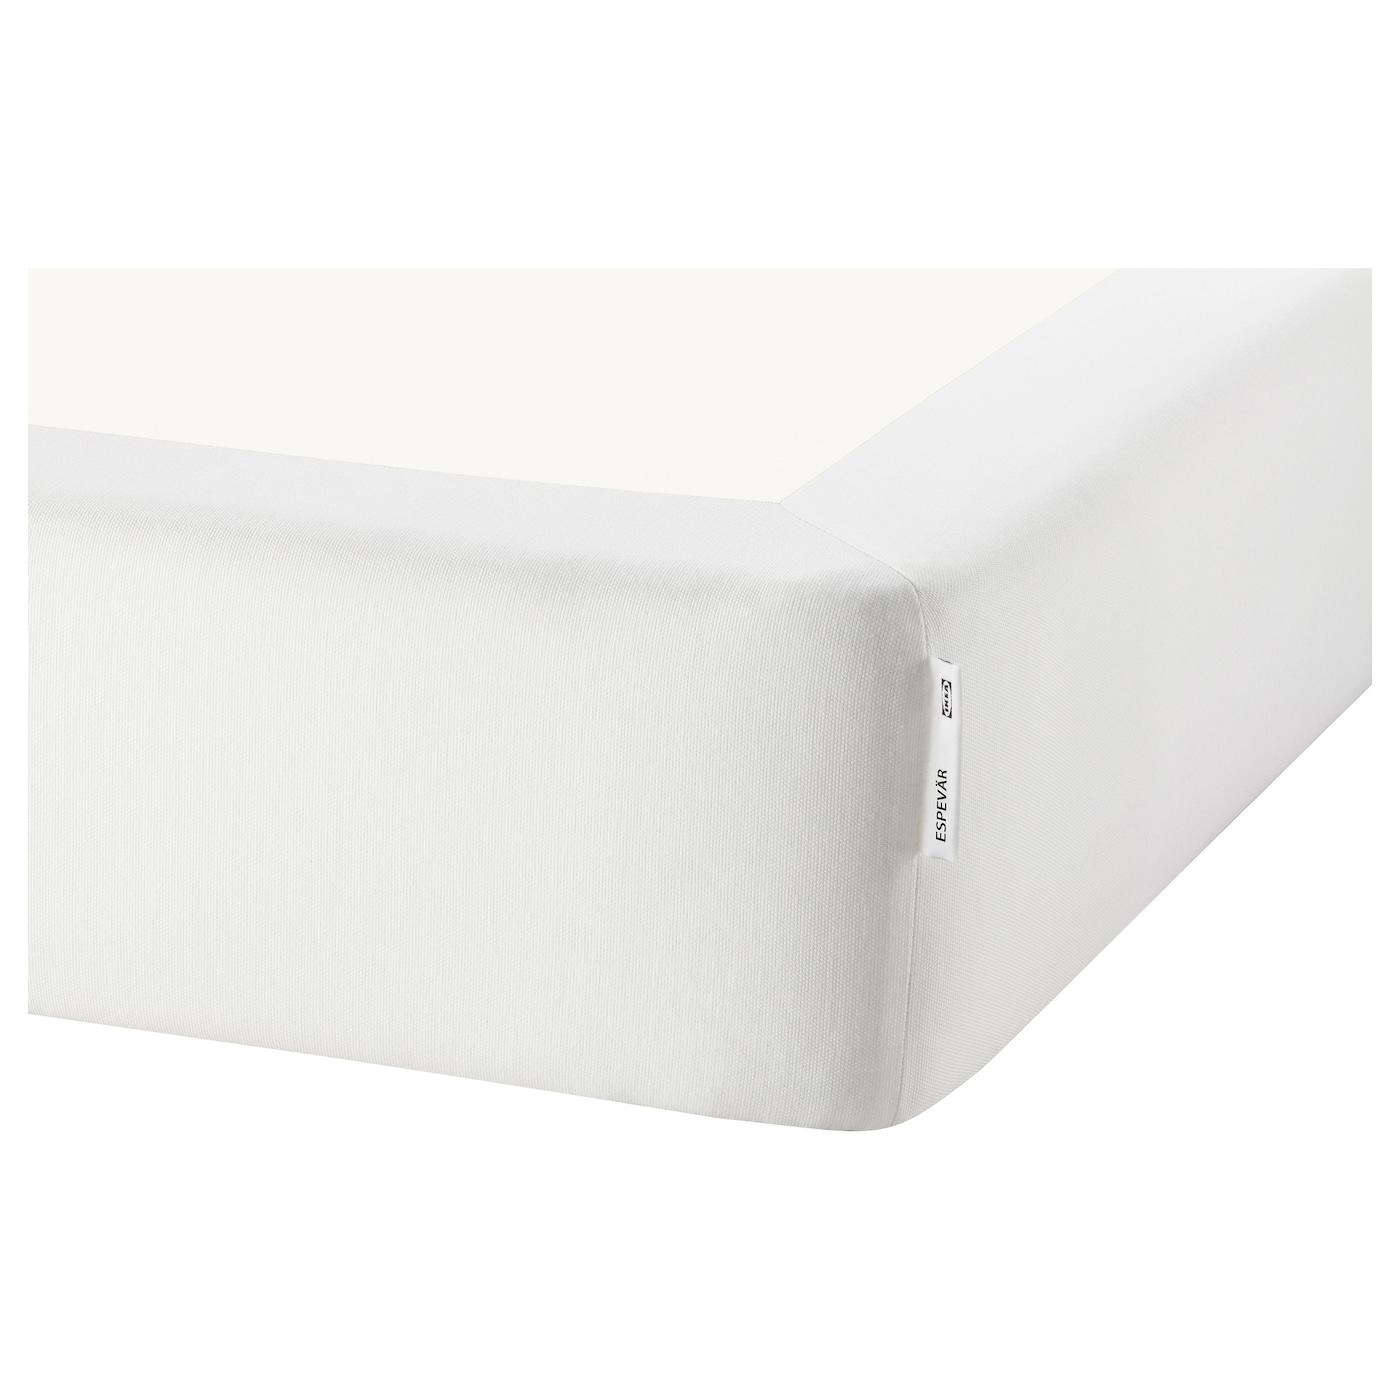 espev r sommier ressorts blanc 140 x 200 cm ikea. Black Bedroom Furniture Sets. Home Design Ideas